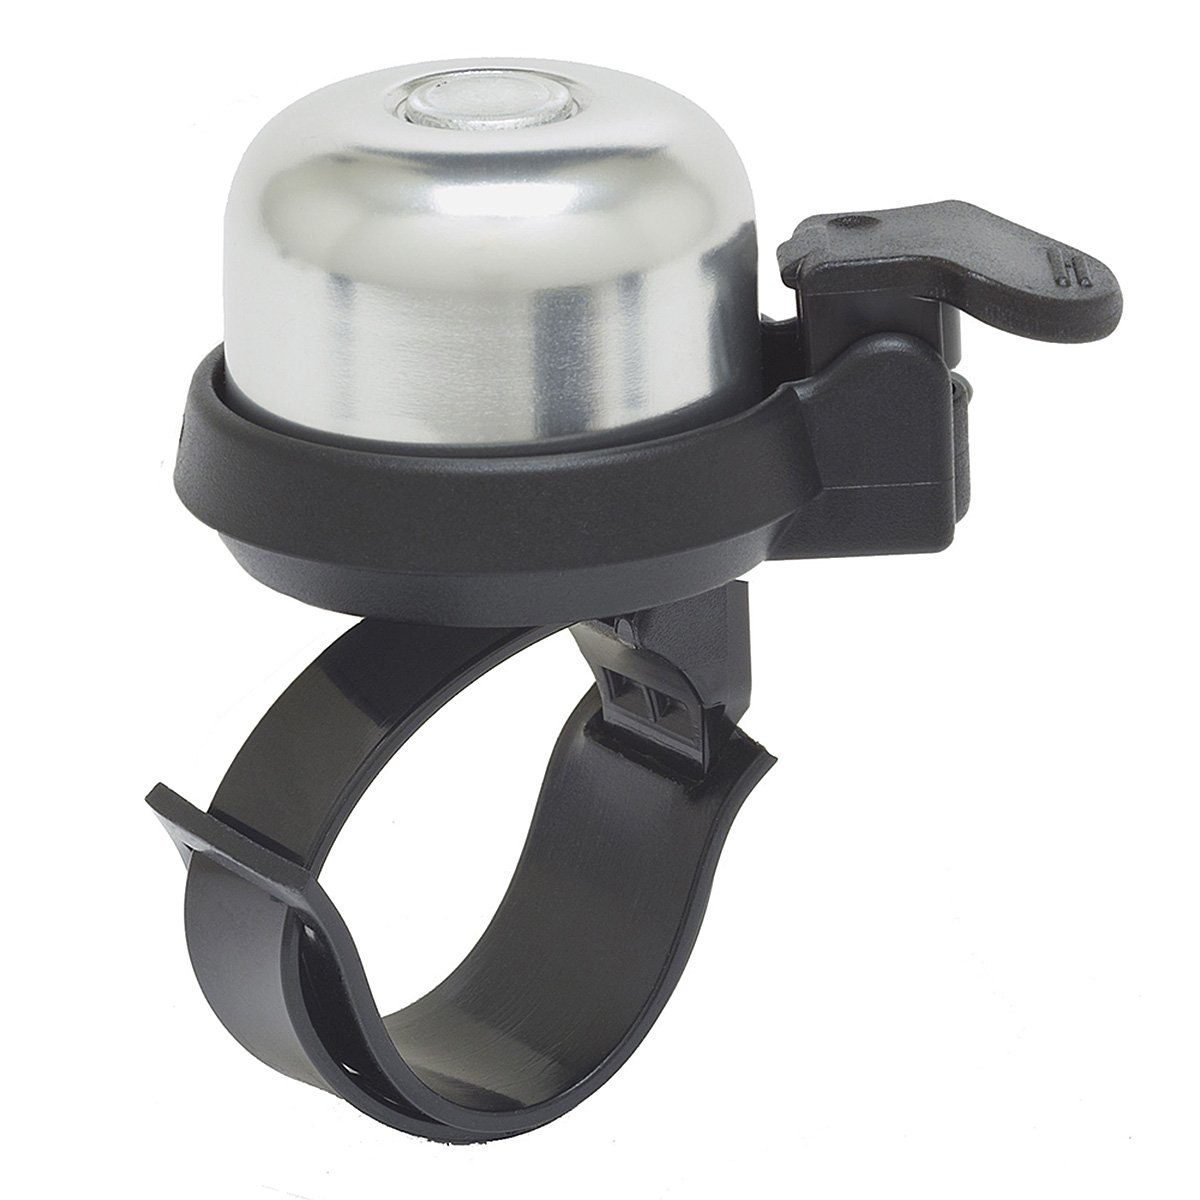 Mirrycle Incredibell Adjustabell 2 Bike Bell, Black MirrycleCorp 20AJBL